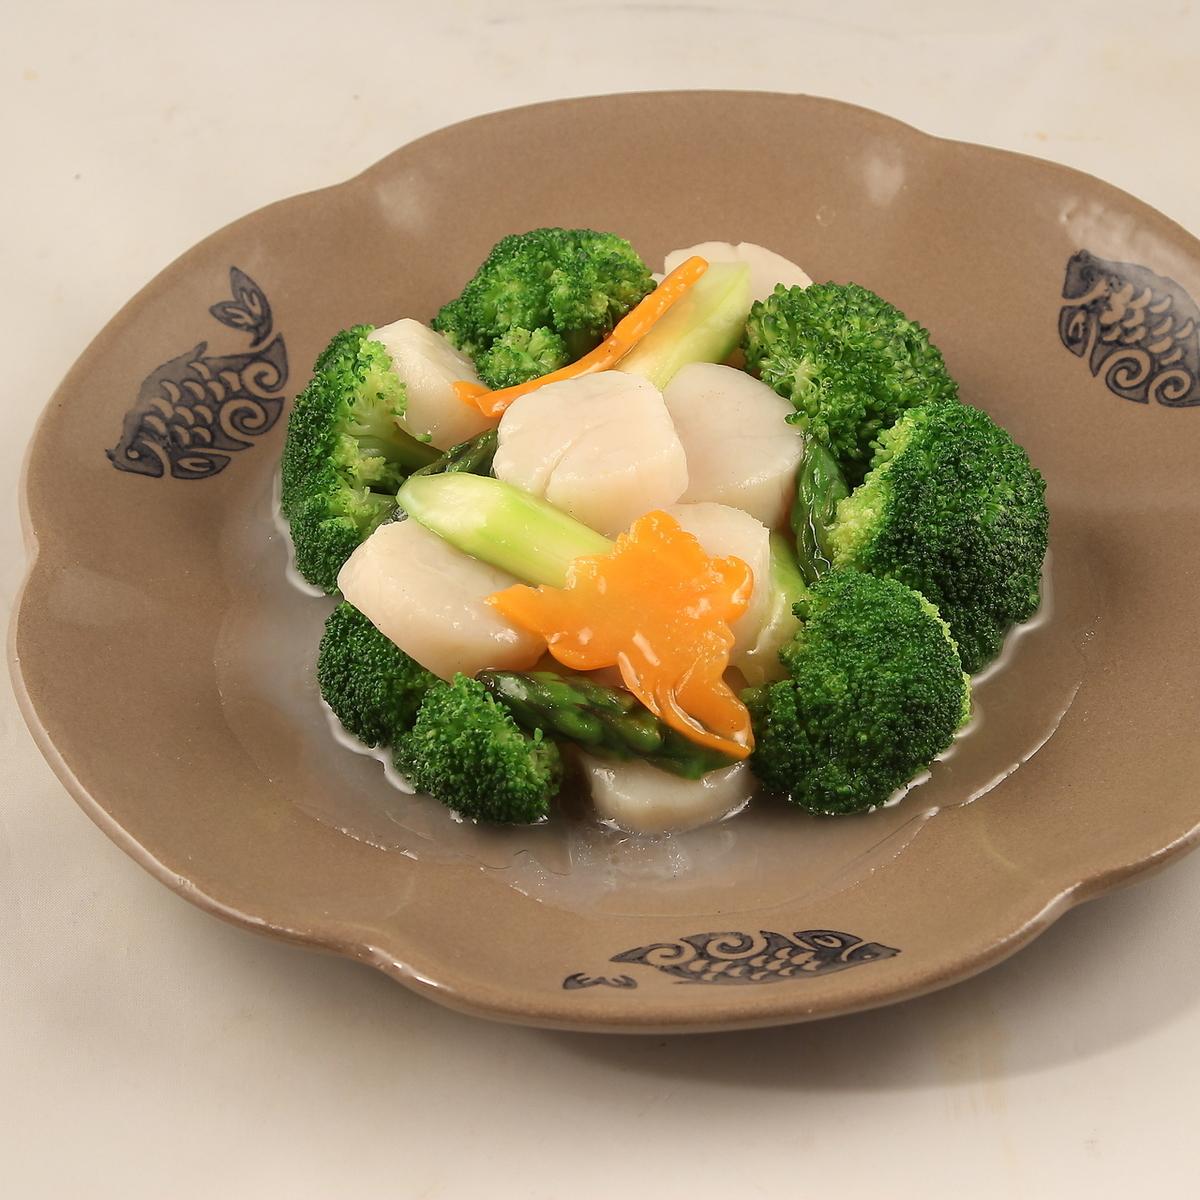 Stir-fried scallops and squid broccoli